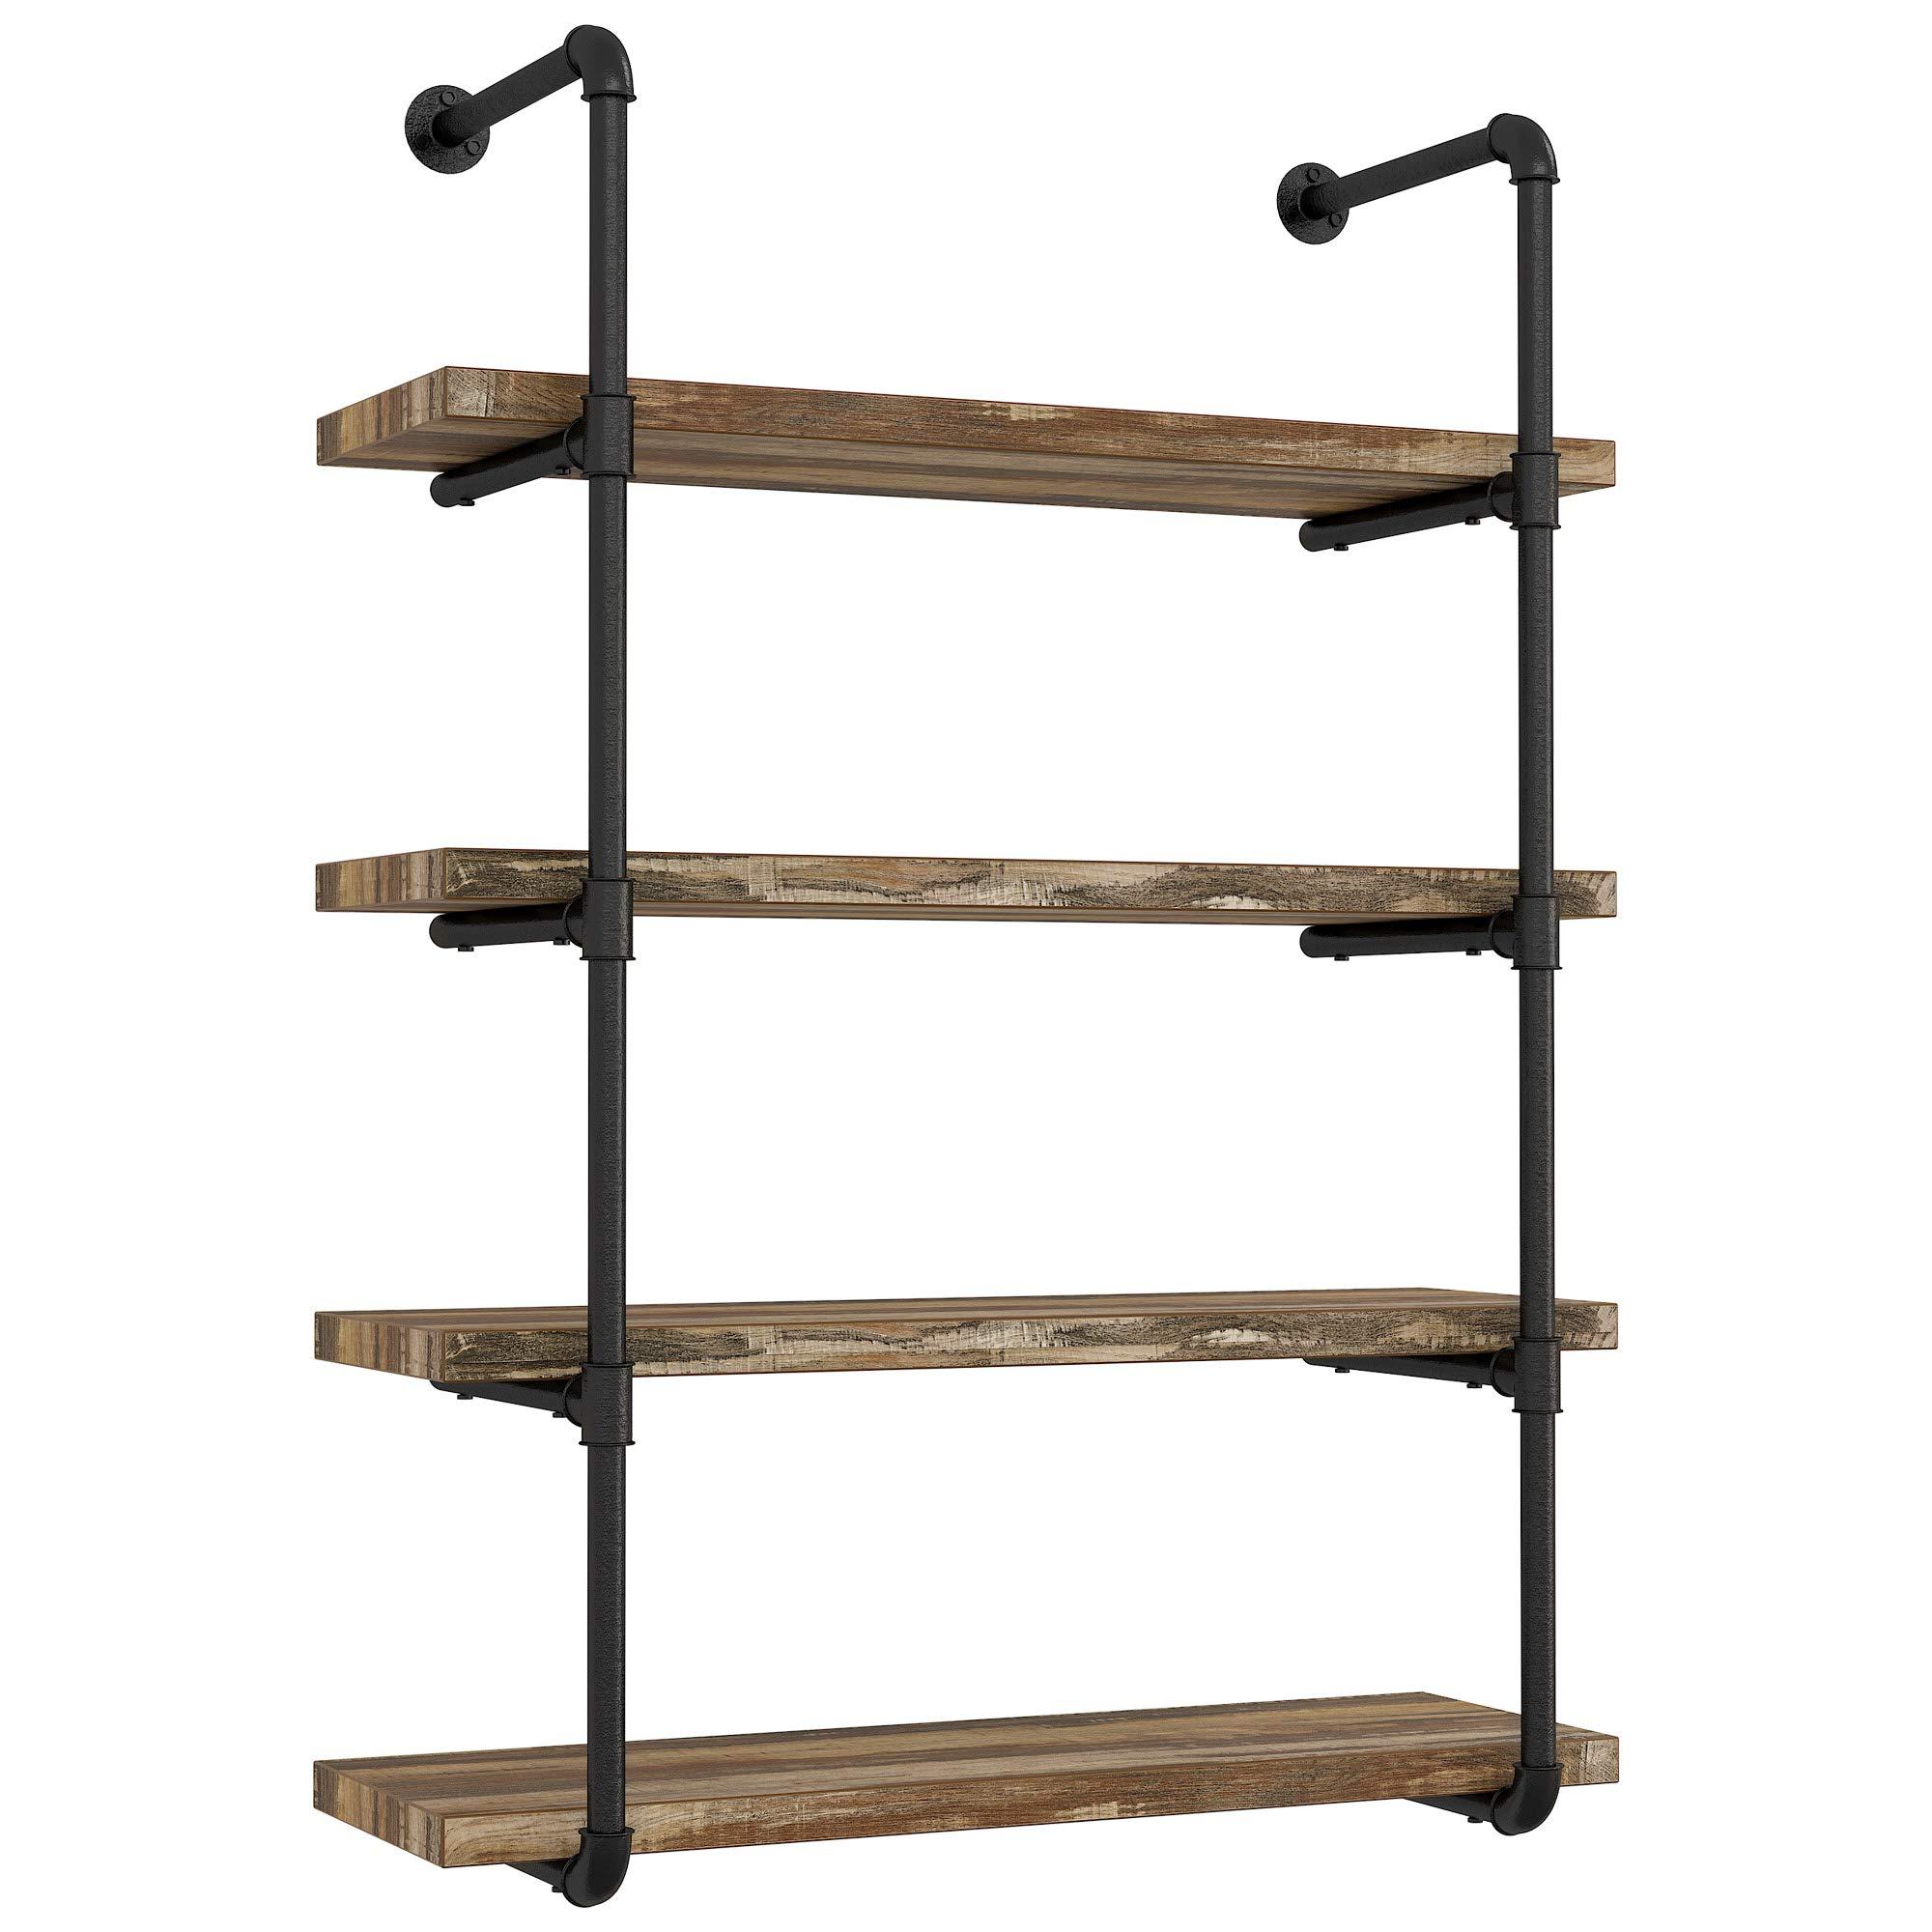 IRONCK Wall Shelf 20 Tier Pipe Shelf, Wood and Metal Frame ...